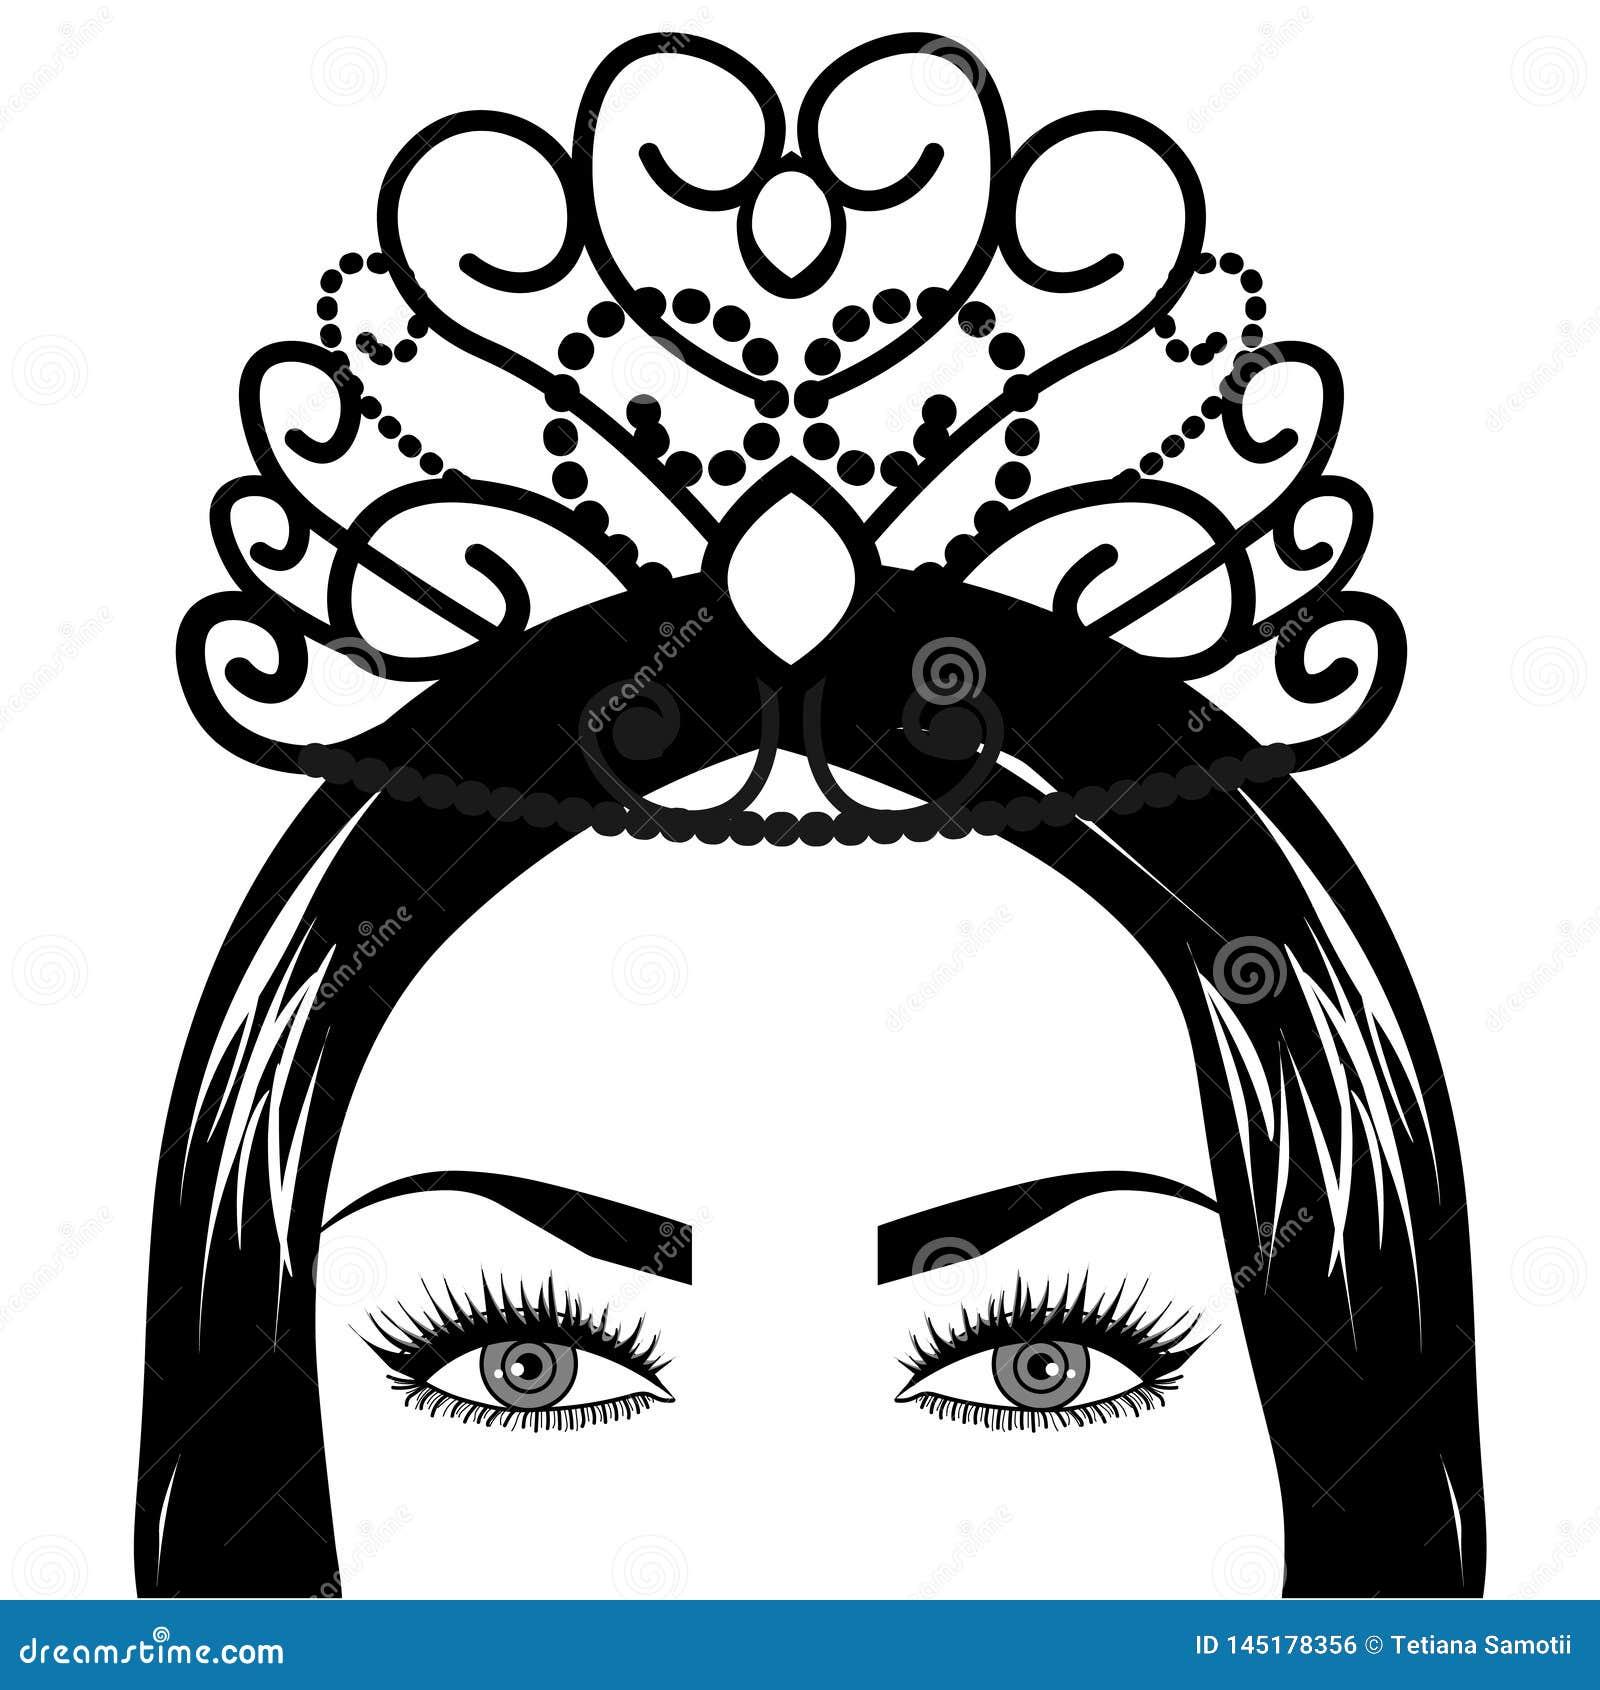 Web Tribal Fusion Boho Diva. Beautiful Asian divine girl with ornate crown, kokoshnik inspired. Bohemian goddess.